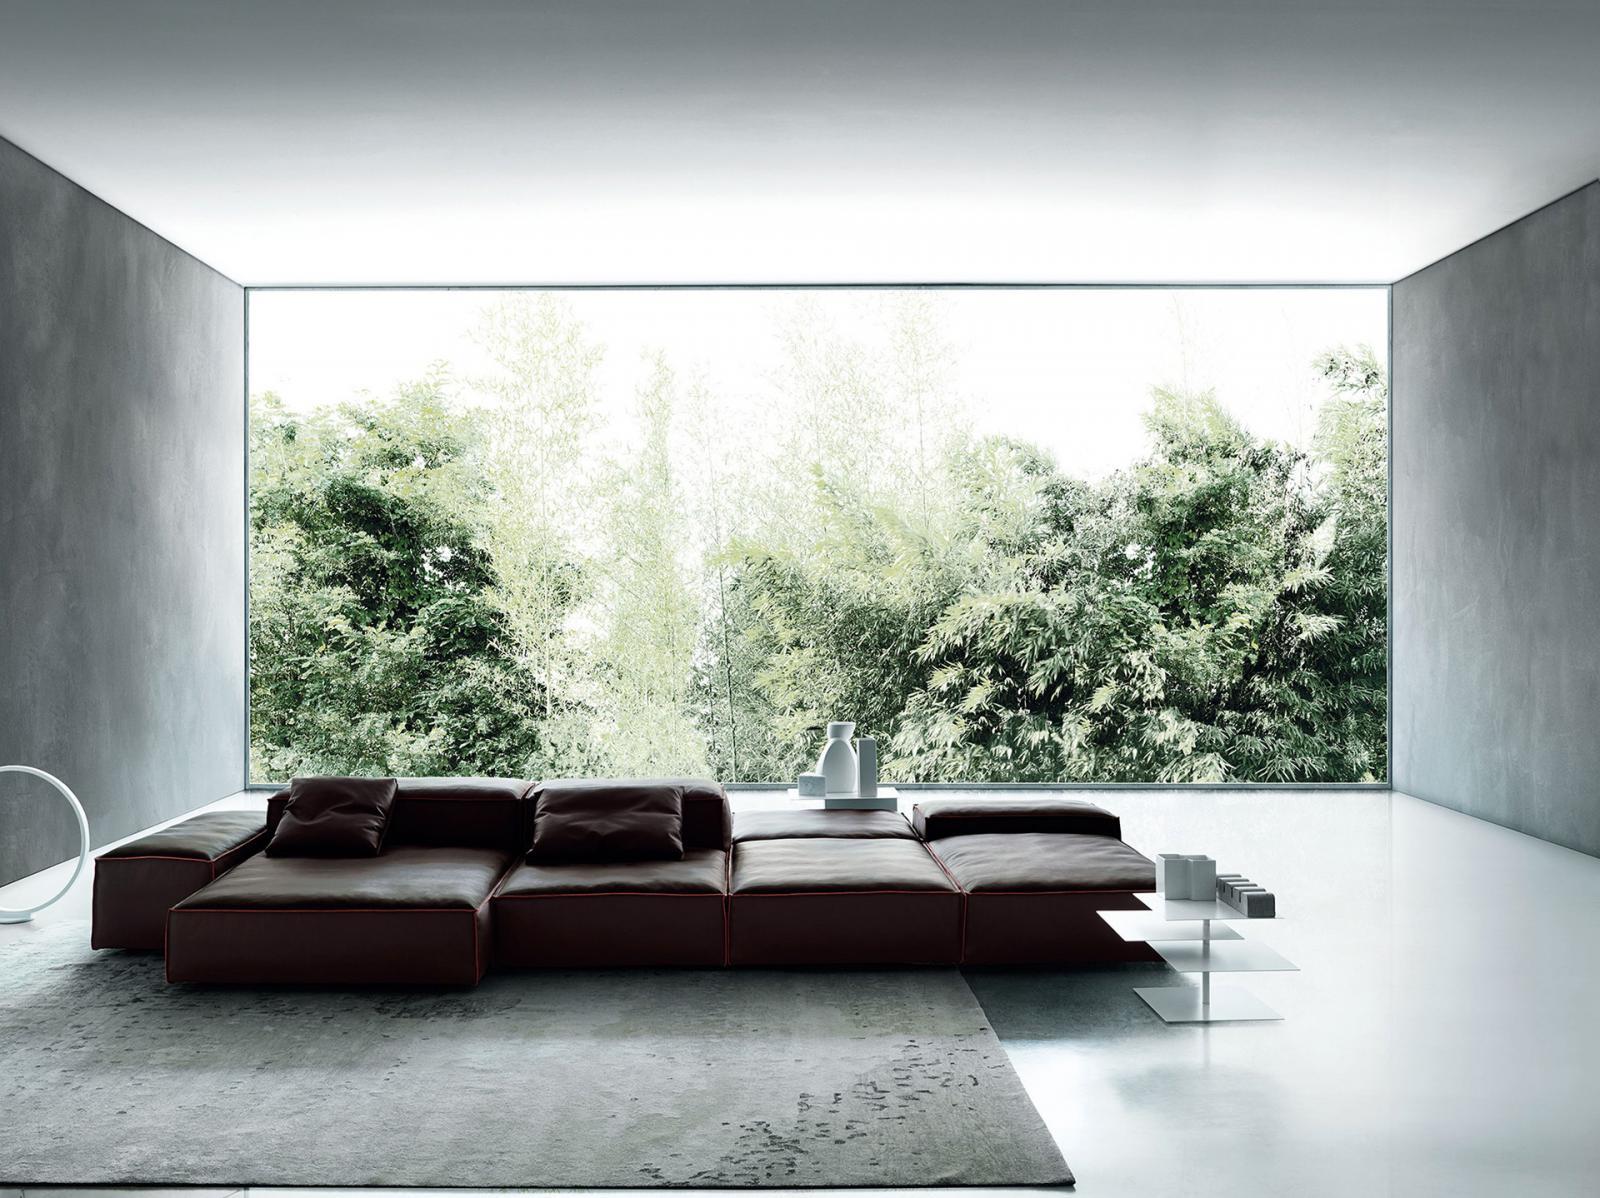 Living Divani: мягкий минимализм made in Italy • Интерьер+Дизайн